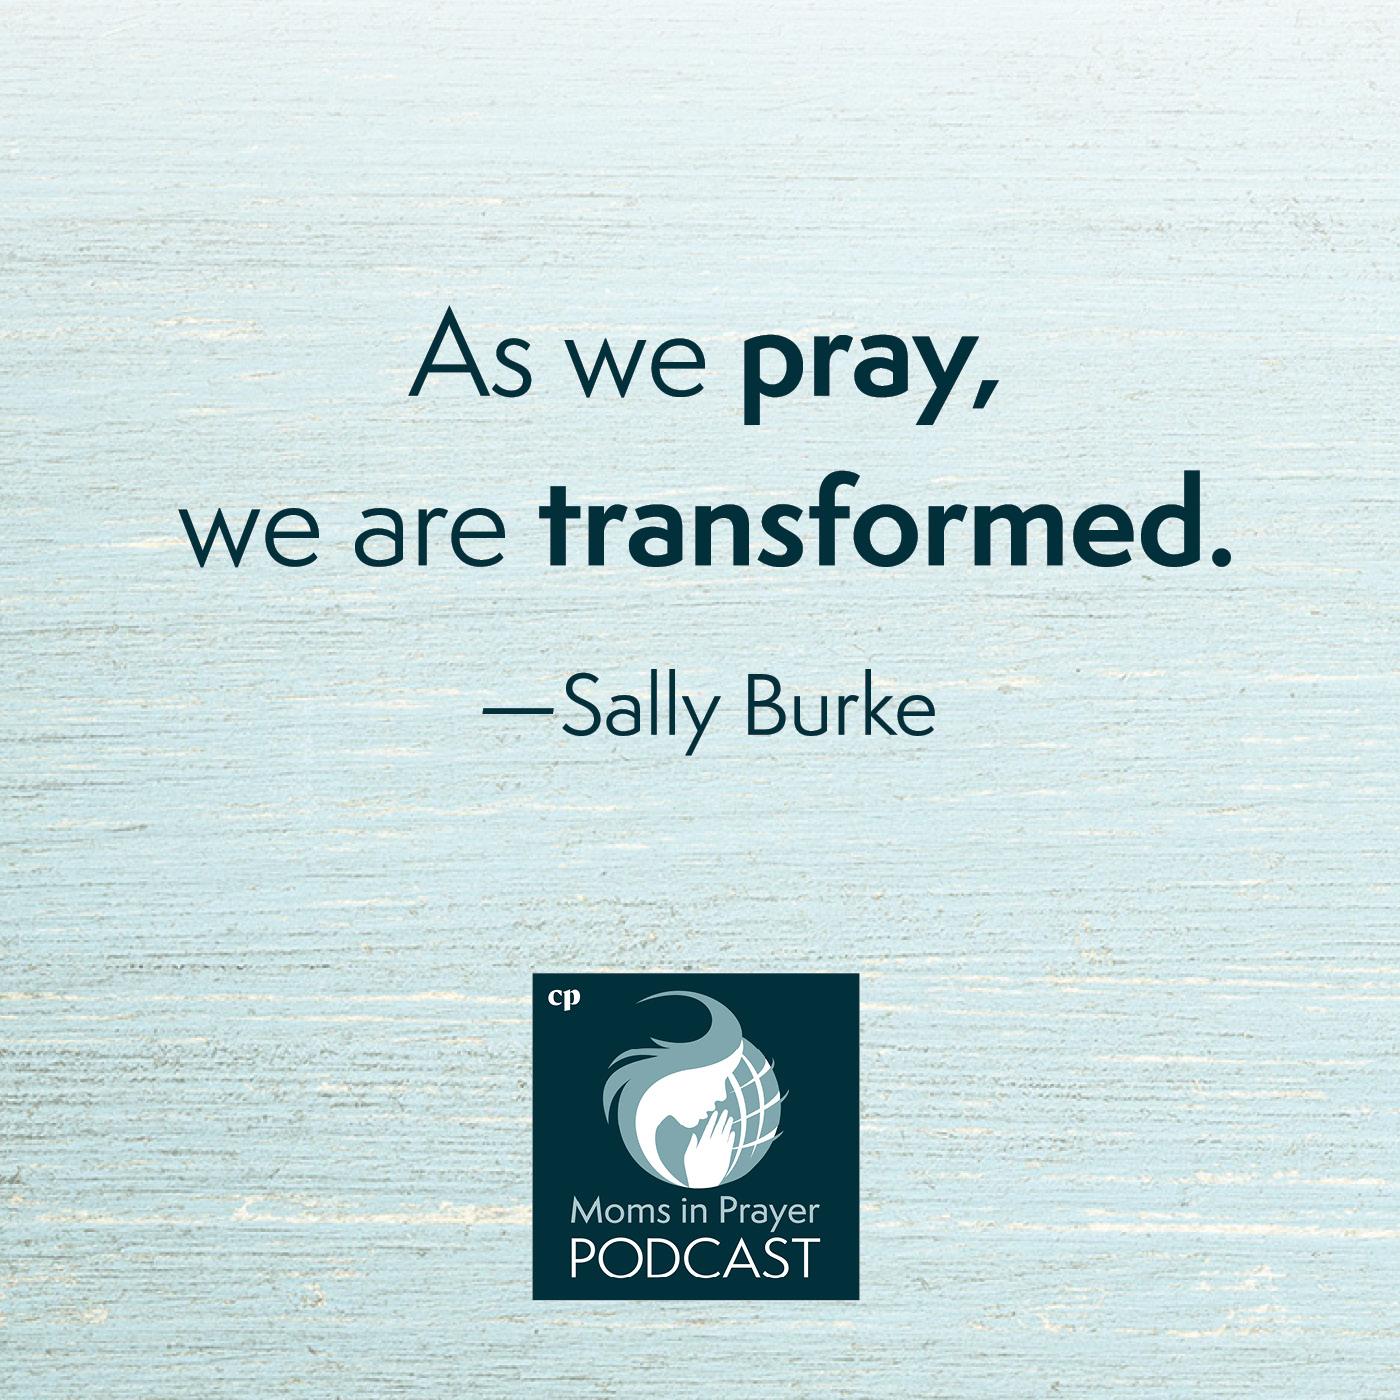 As we pray we are transformed Moms in Prayer International